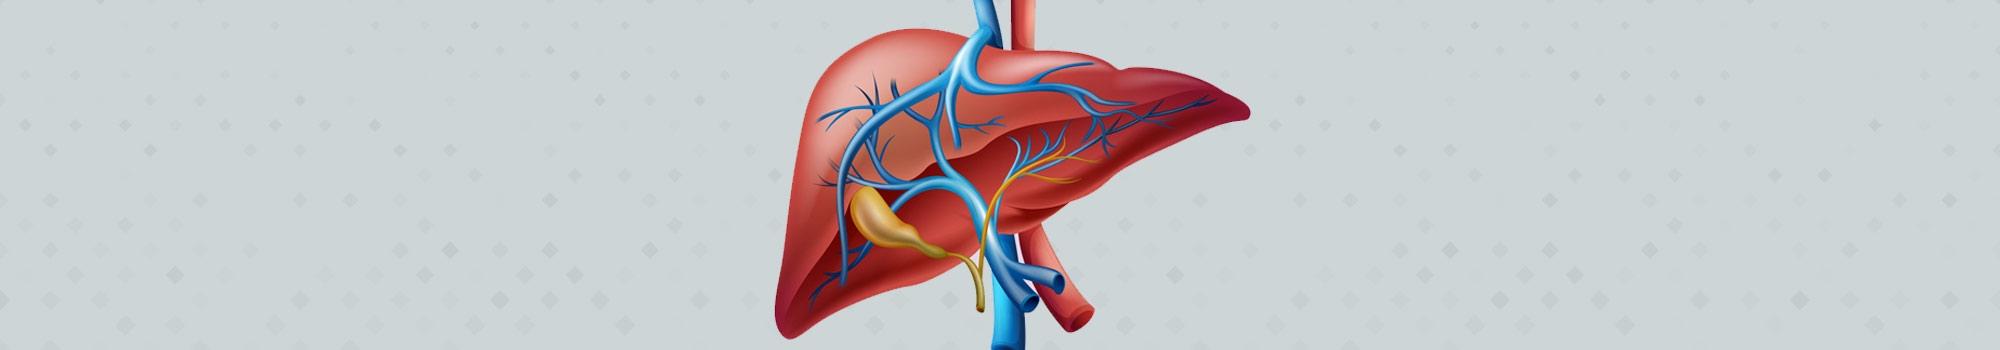 Liver transplant in Delhi (@liverhelplineindia) Cover Image